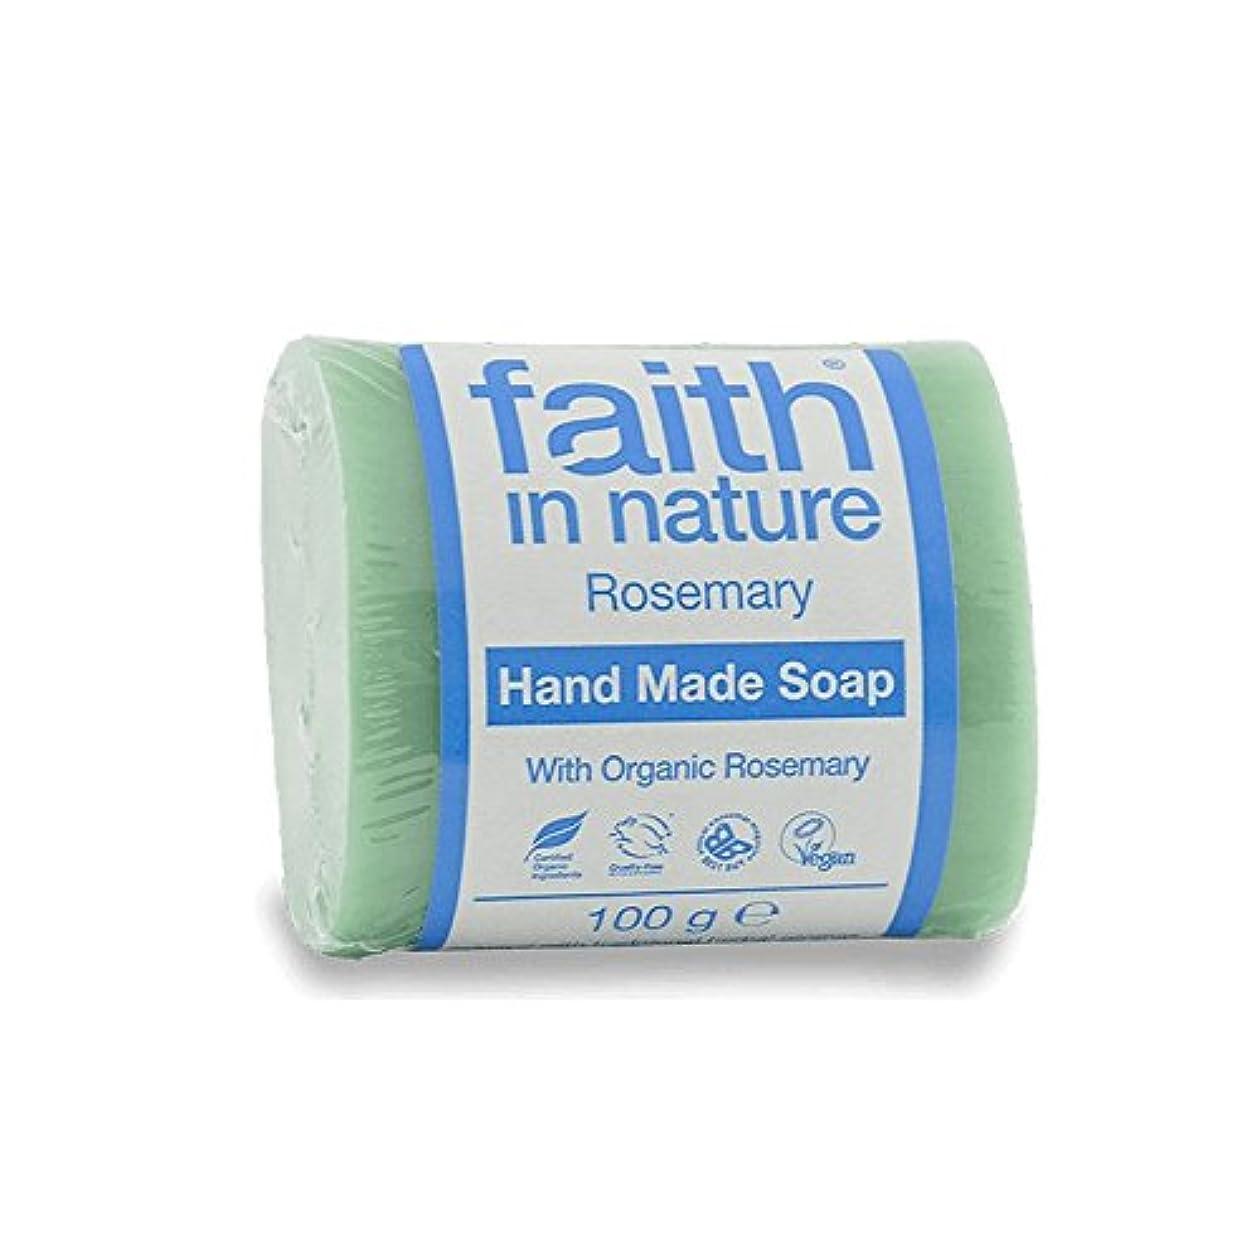 Faith in Nature Rosemary Soap 100g (Pack of 2) - 自然ローズマリーソープ100グラムの信仰 (x2) [並行輸入品]